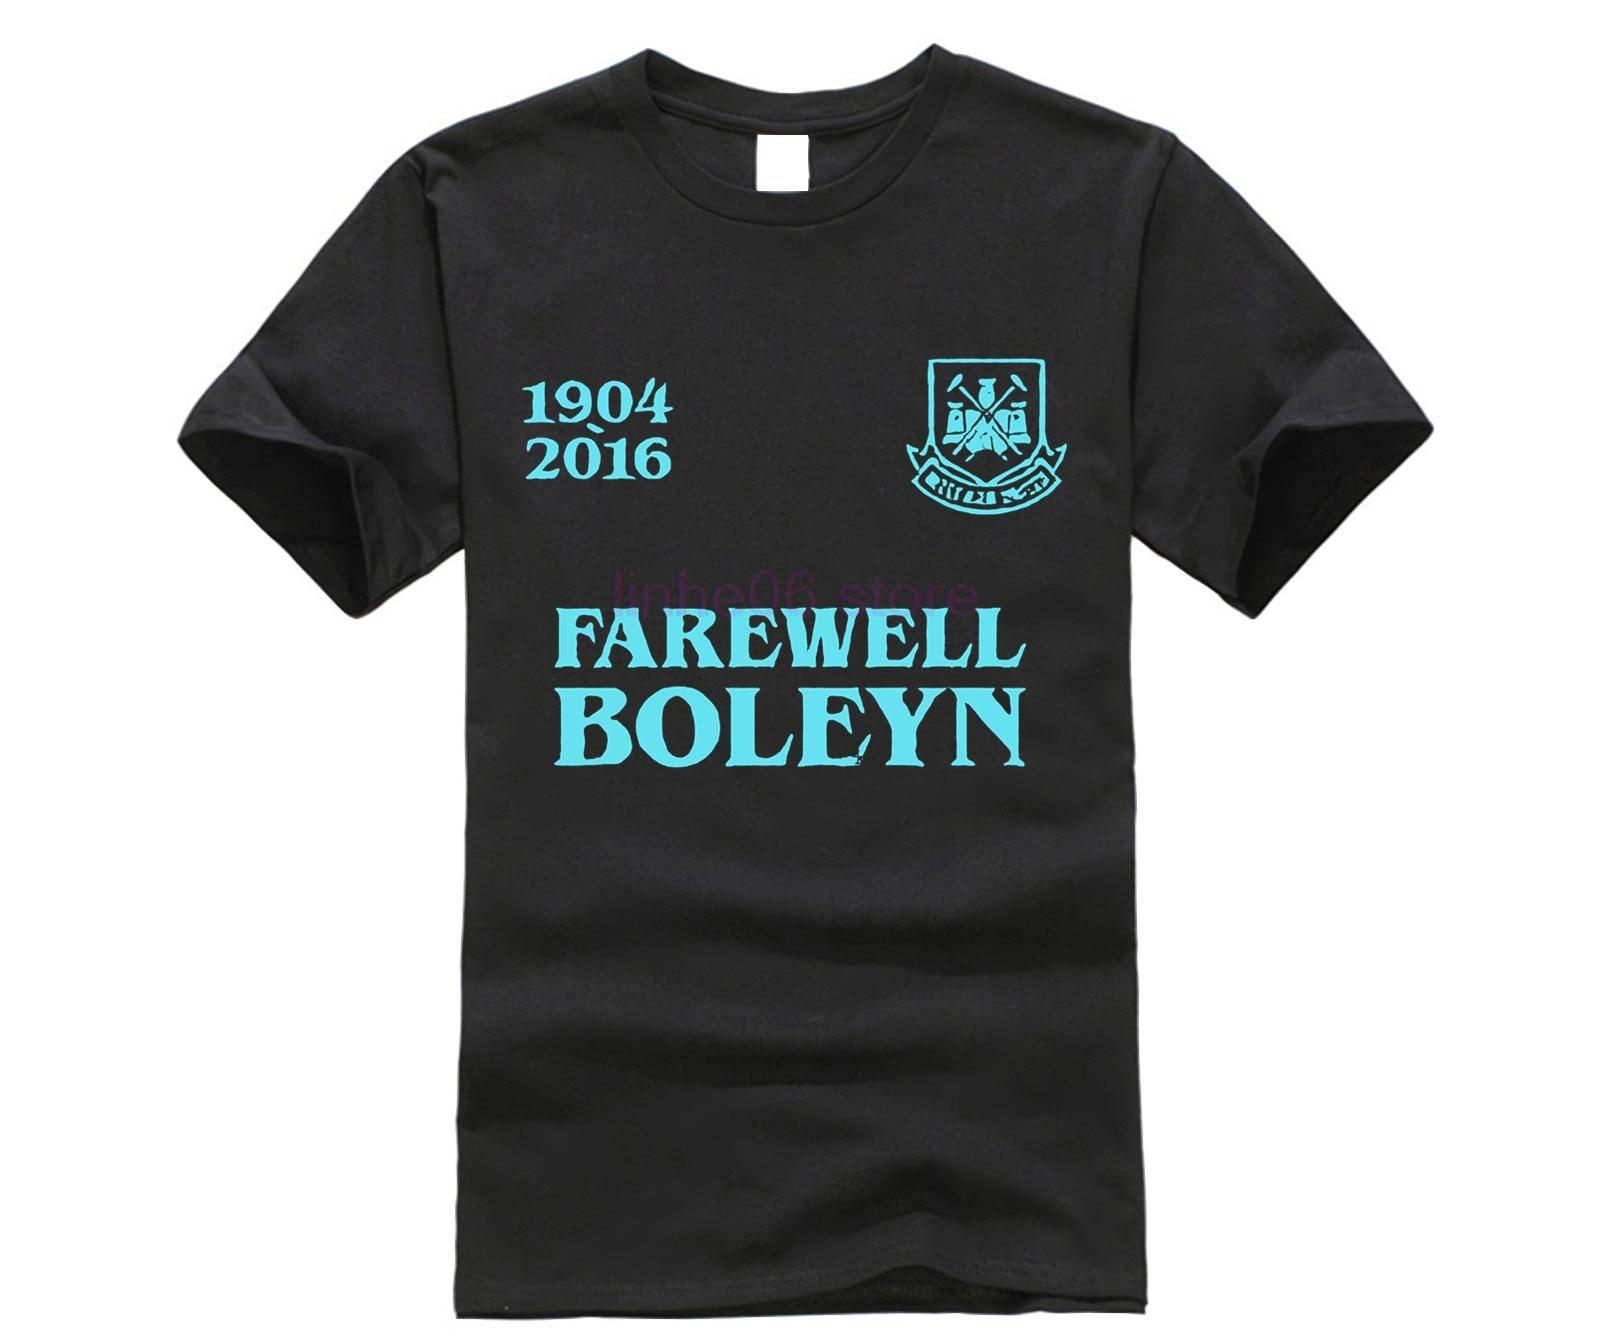 Farewell Boleyn T Shirt West Ham Ground Upton Park Hammers Tribute Mens Gift Top